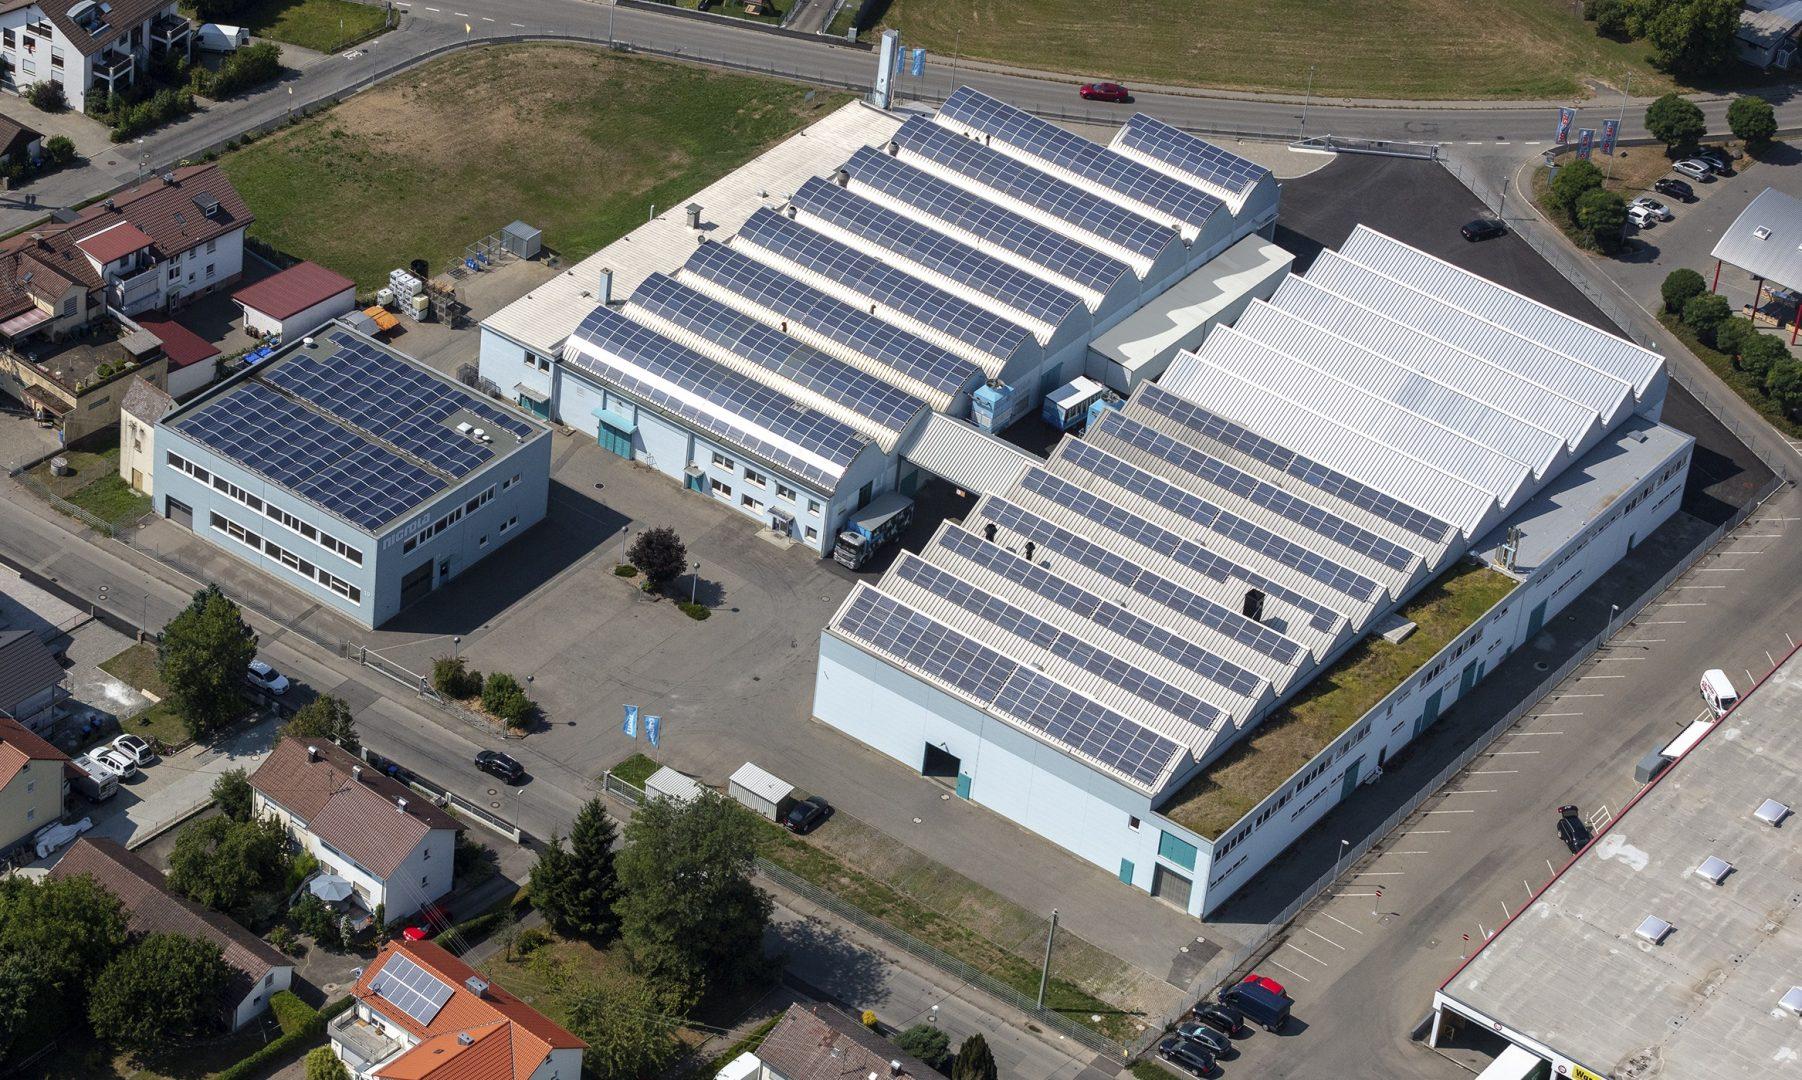 Luftaufnahme Nicrola GmbH & Co. KG Standort Tettnang